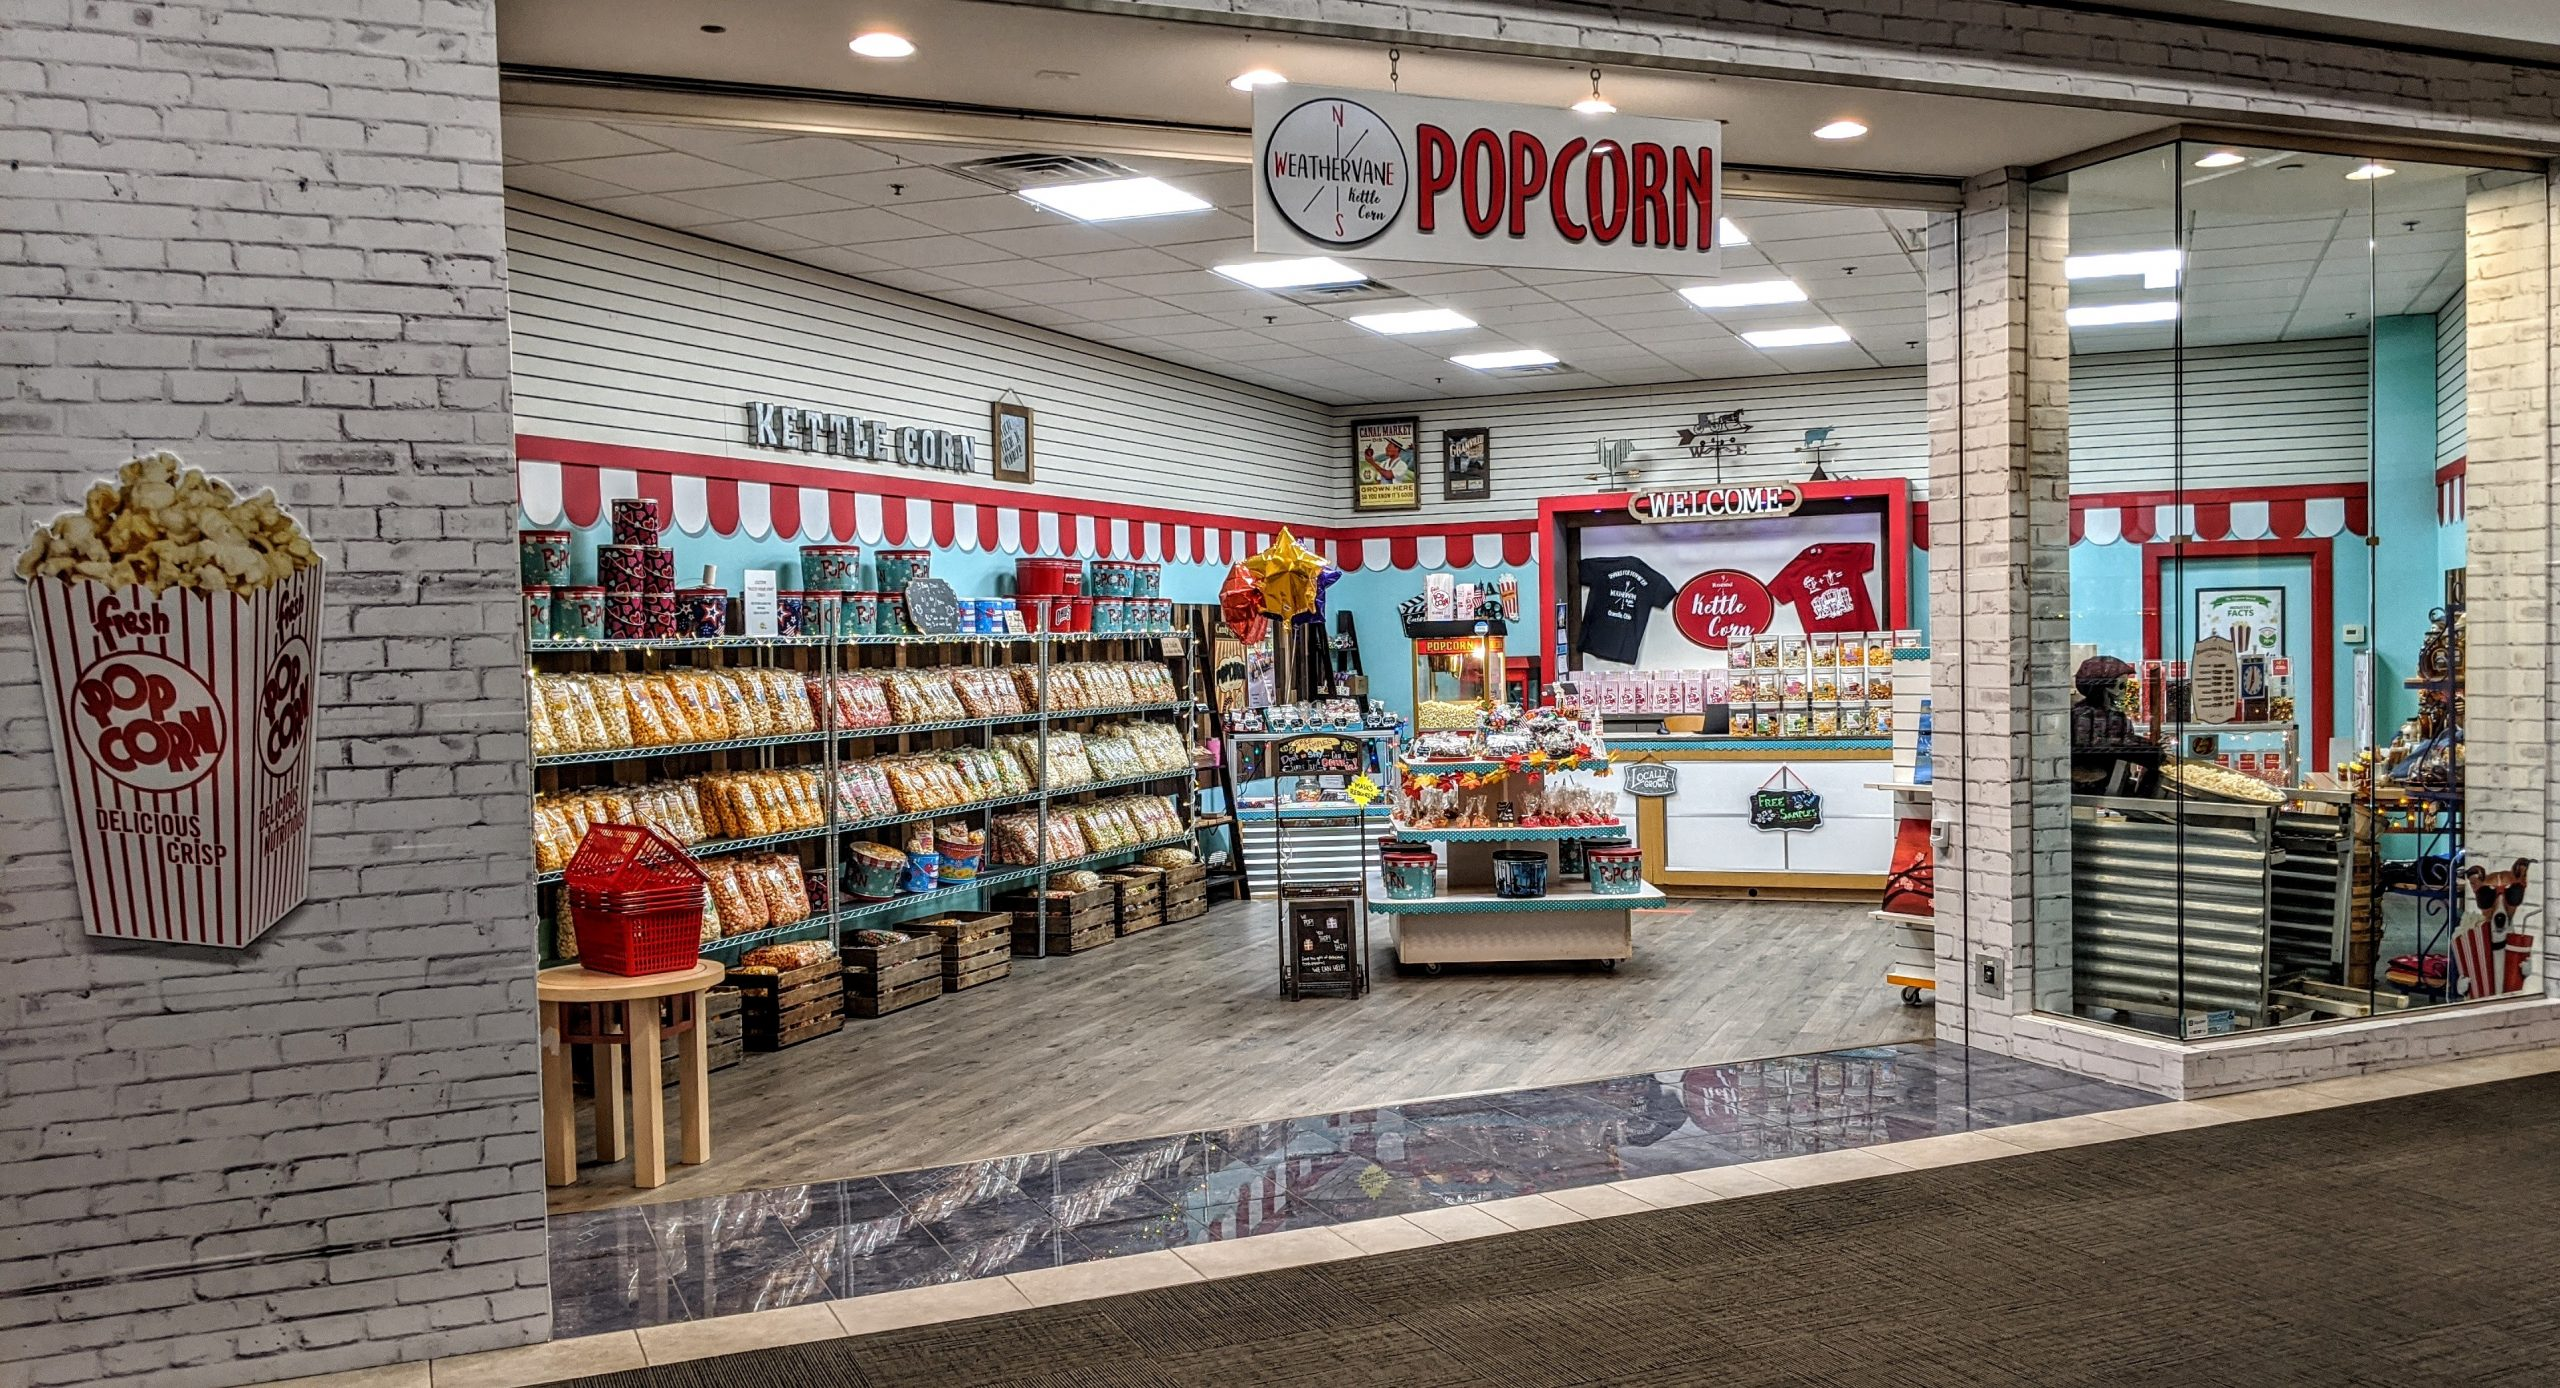 Popcorn store